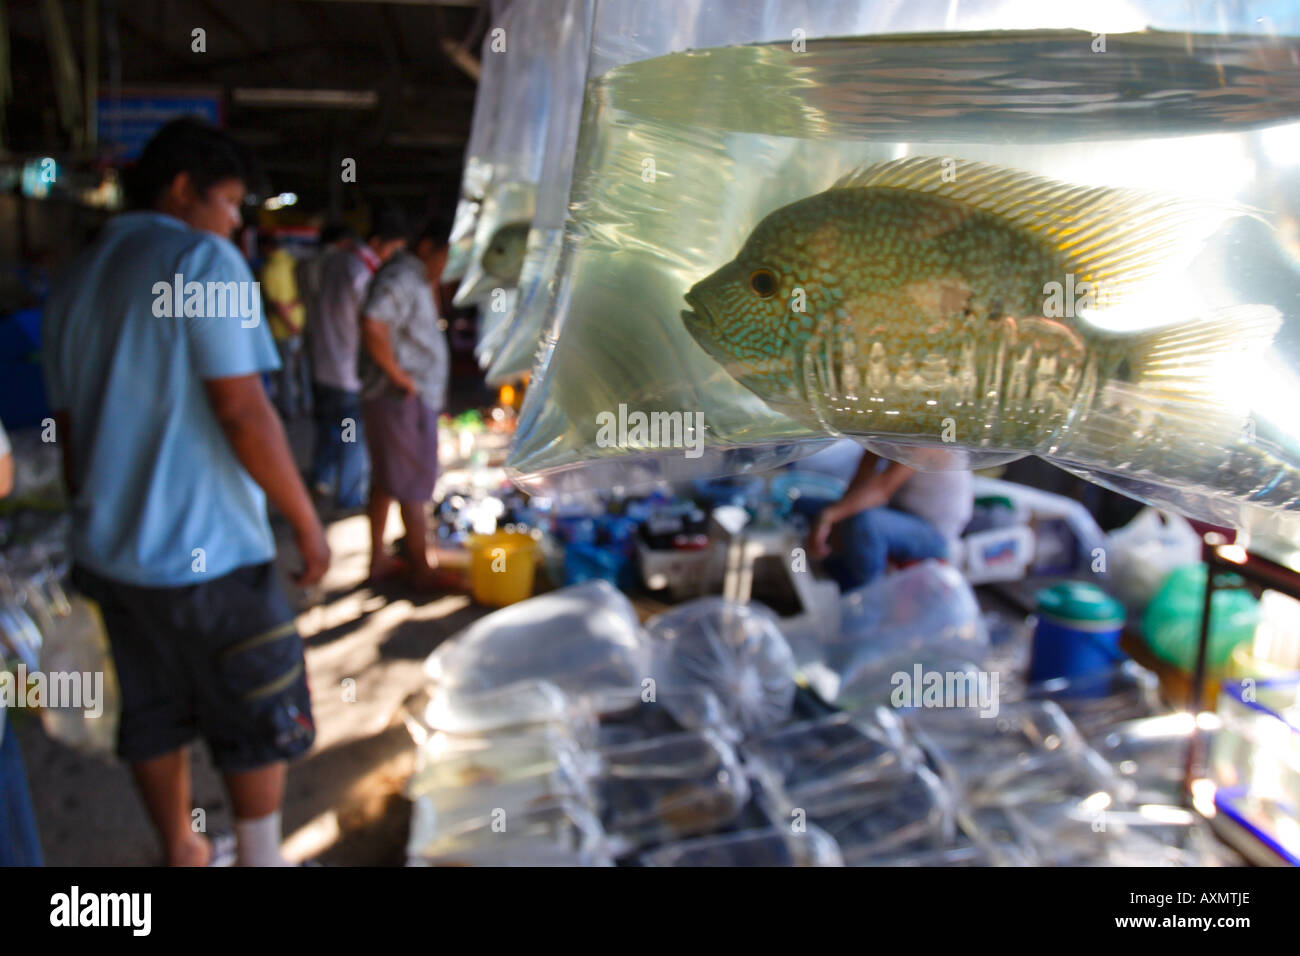 Chatuchak Weekend Market, Bangkok, Thailand. - Stock Image